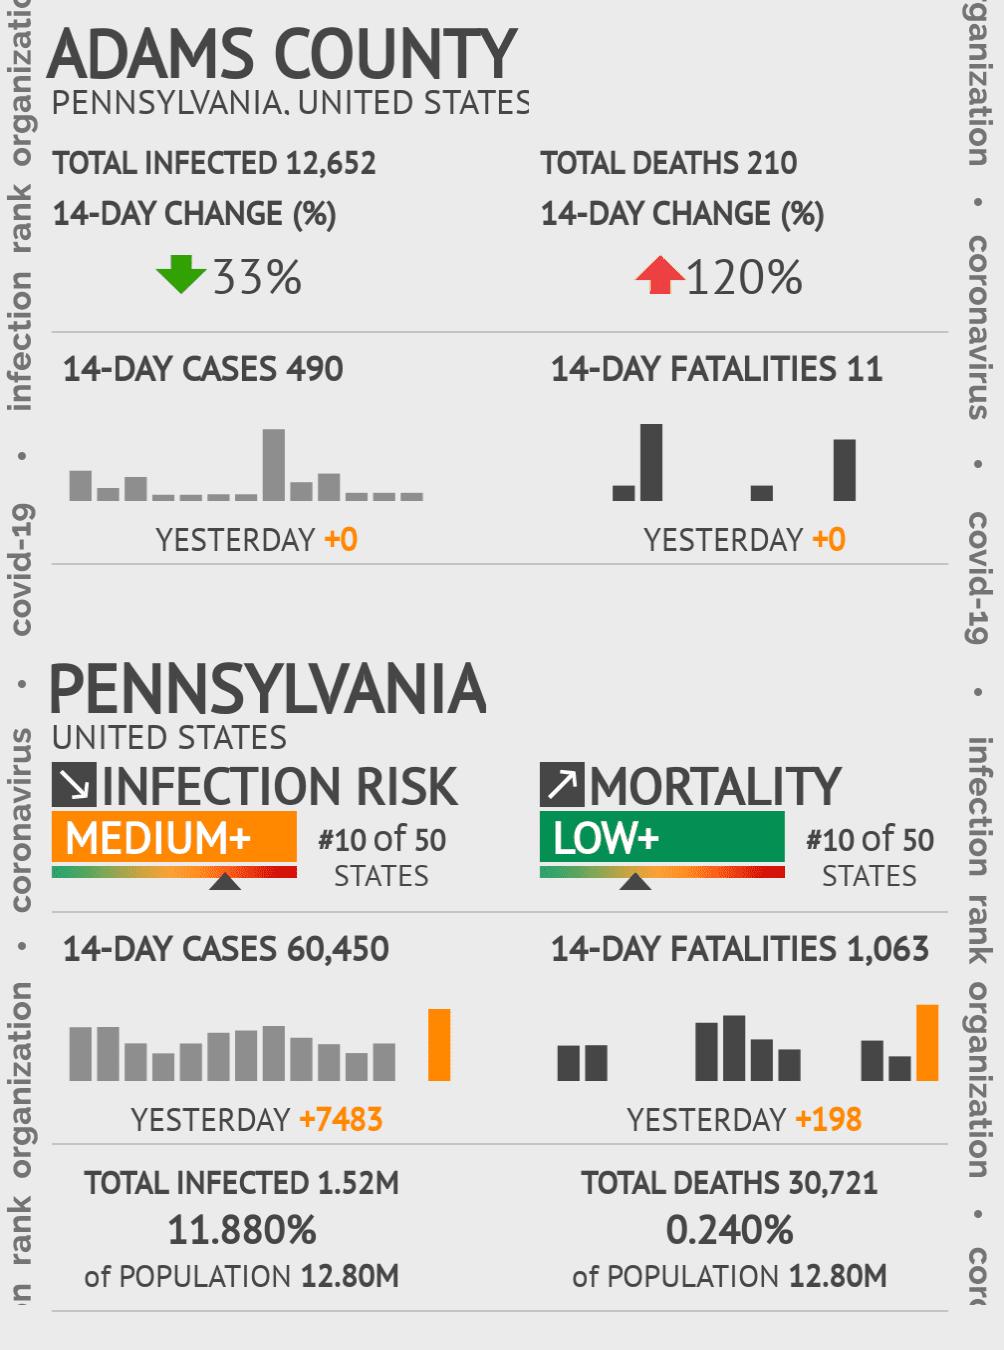 Adams County Coronavirus Covid-19 Risk of Infection on October 24, 2020